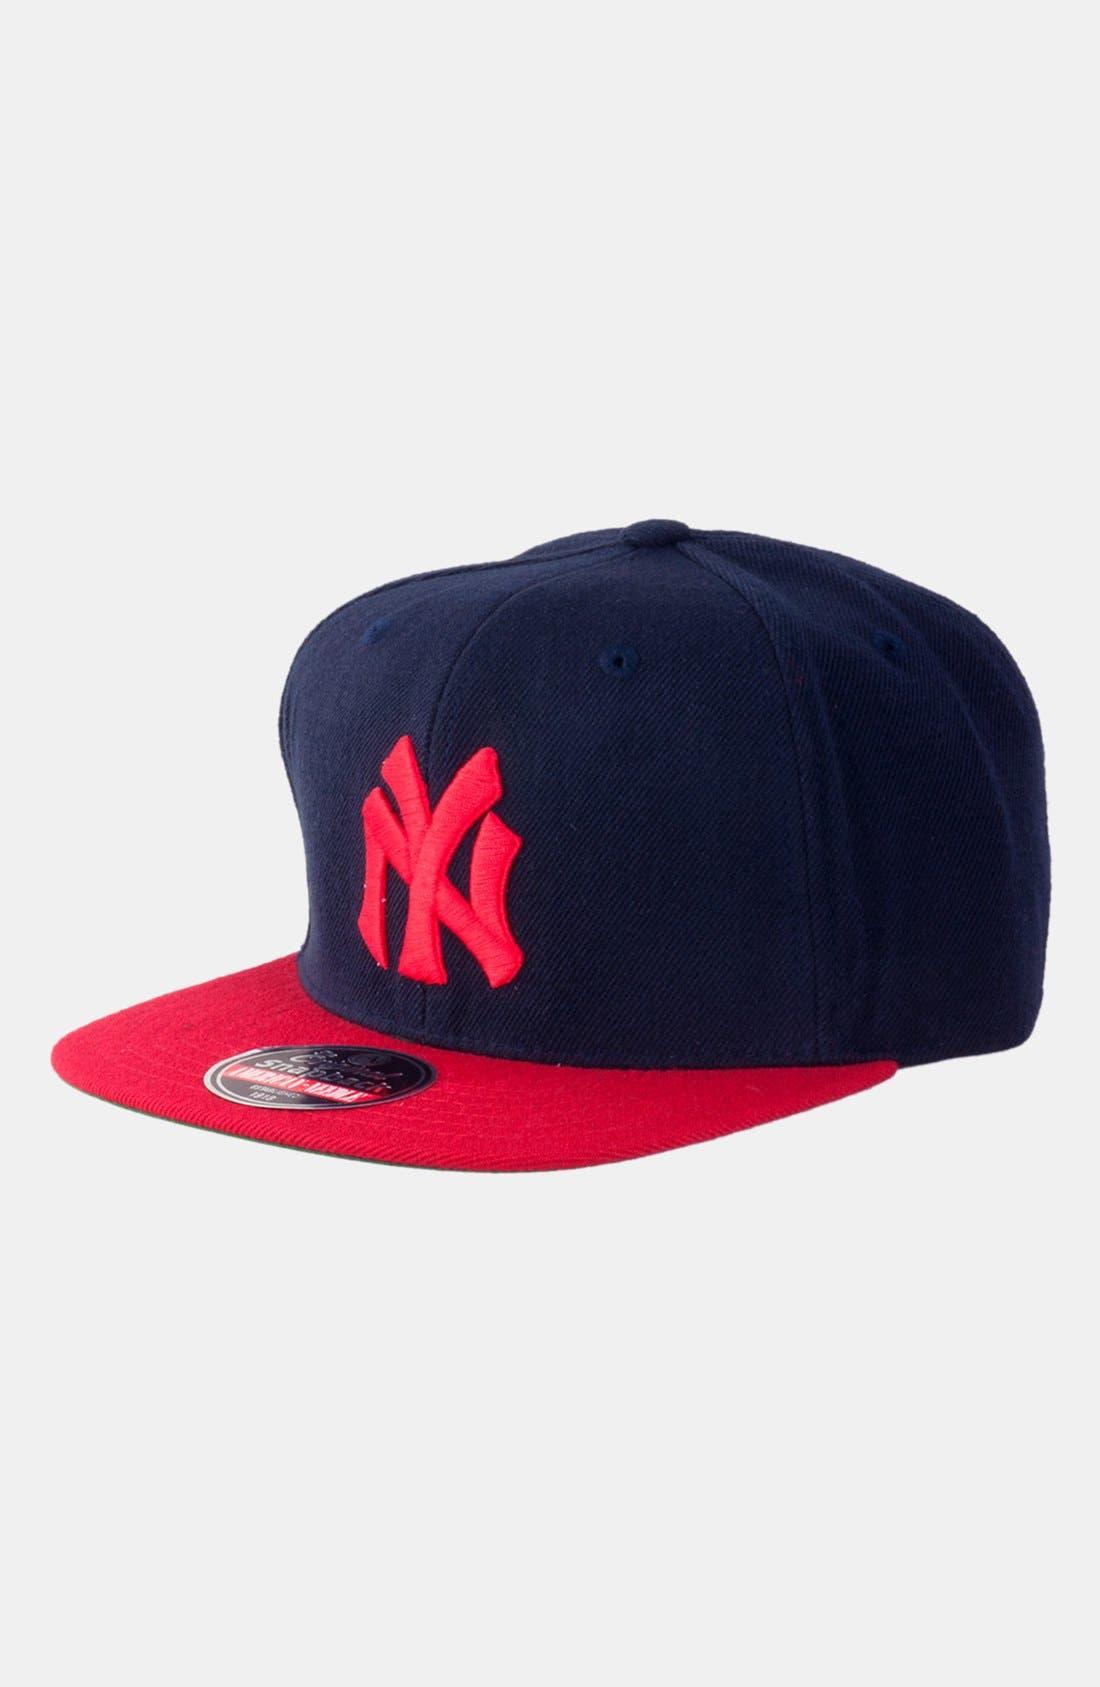 Main Image - American Needle 'New York Yankees 1910 - 400 Series' Snapback Baseball Cap